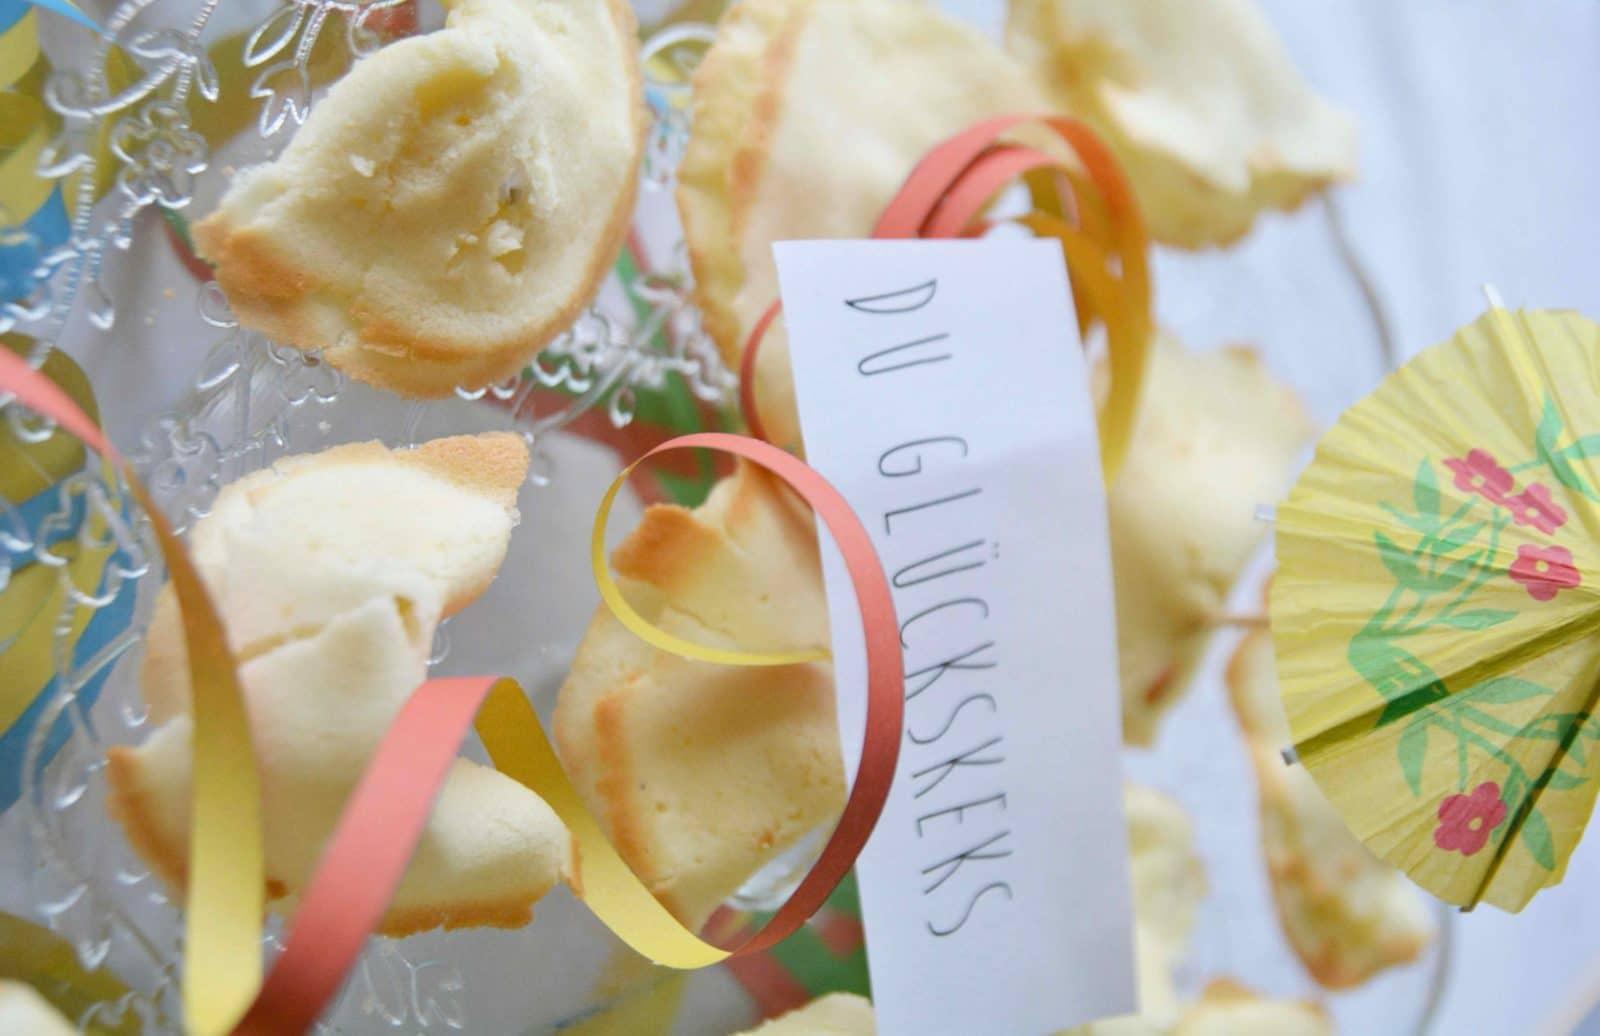 DIY-Glückskekse für die Silvesterparty